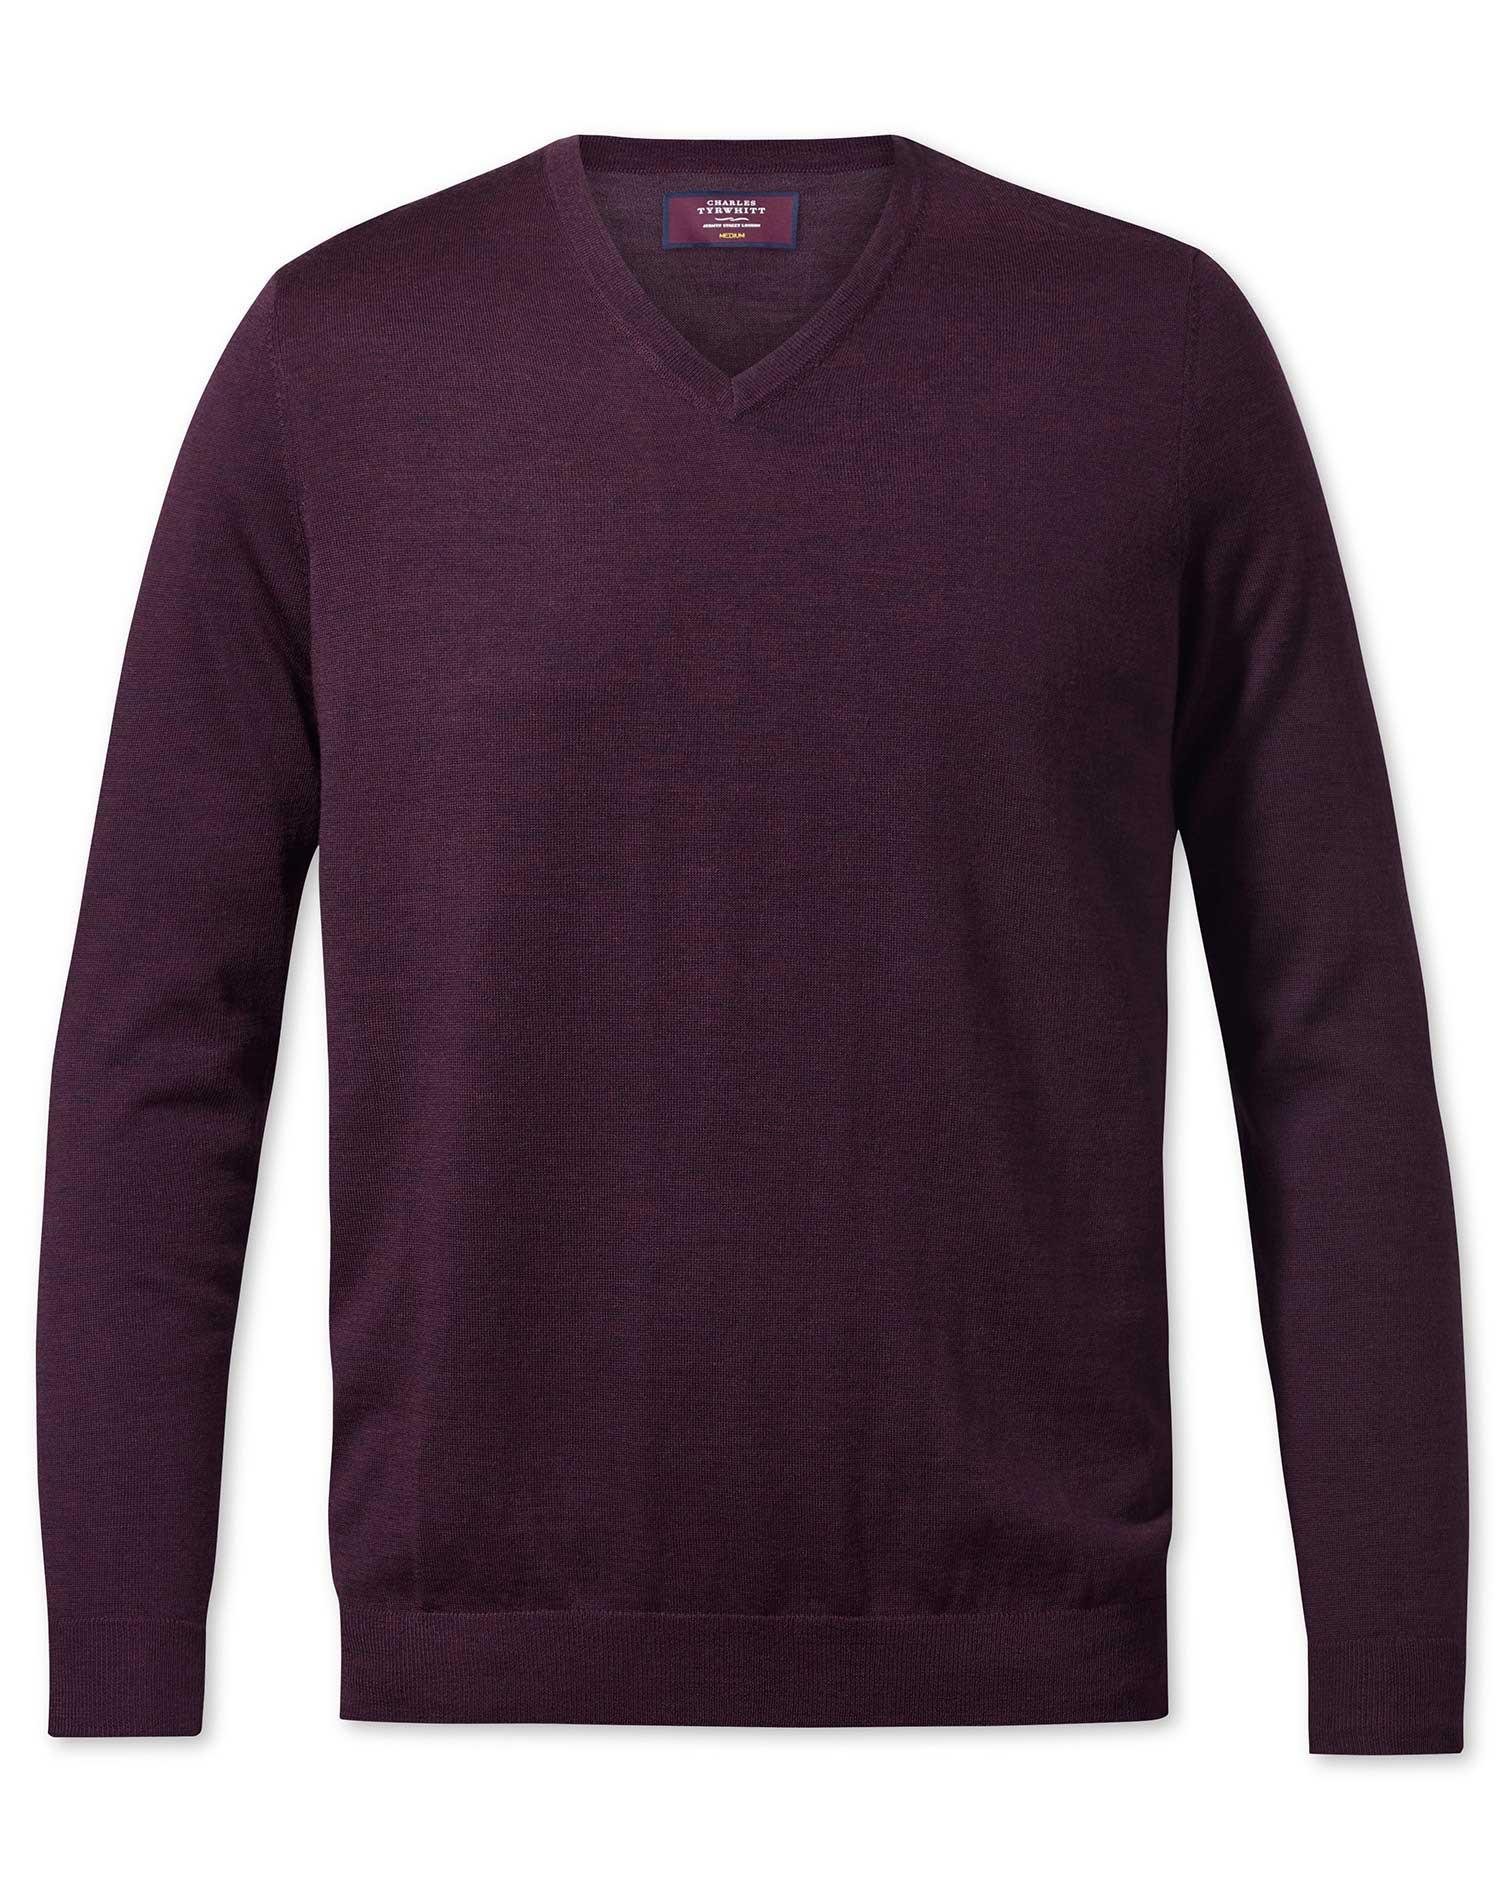 Wine V-Neck Merino-Silk Wool Jumper Size XS by Charles Tyrwhitt